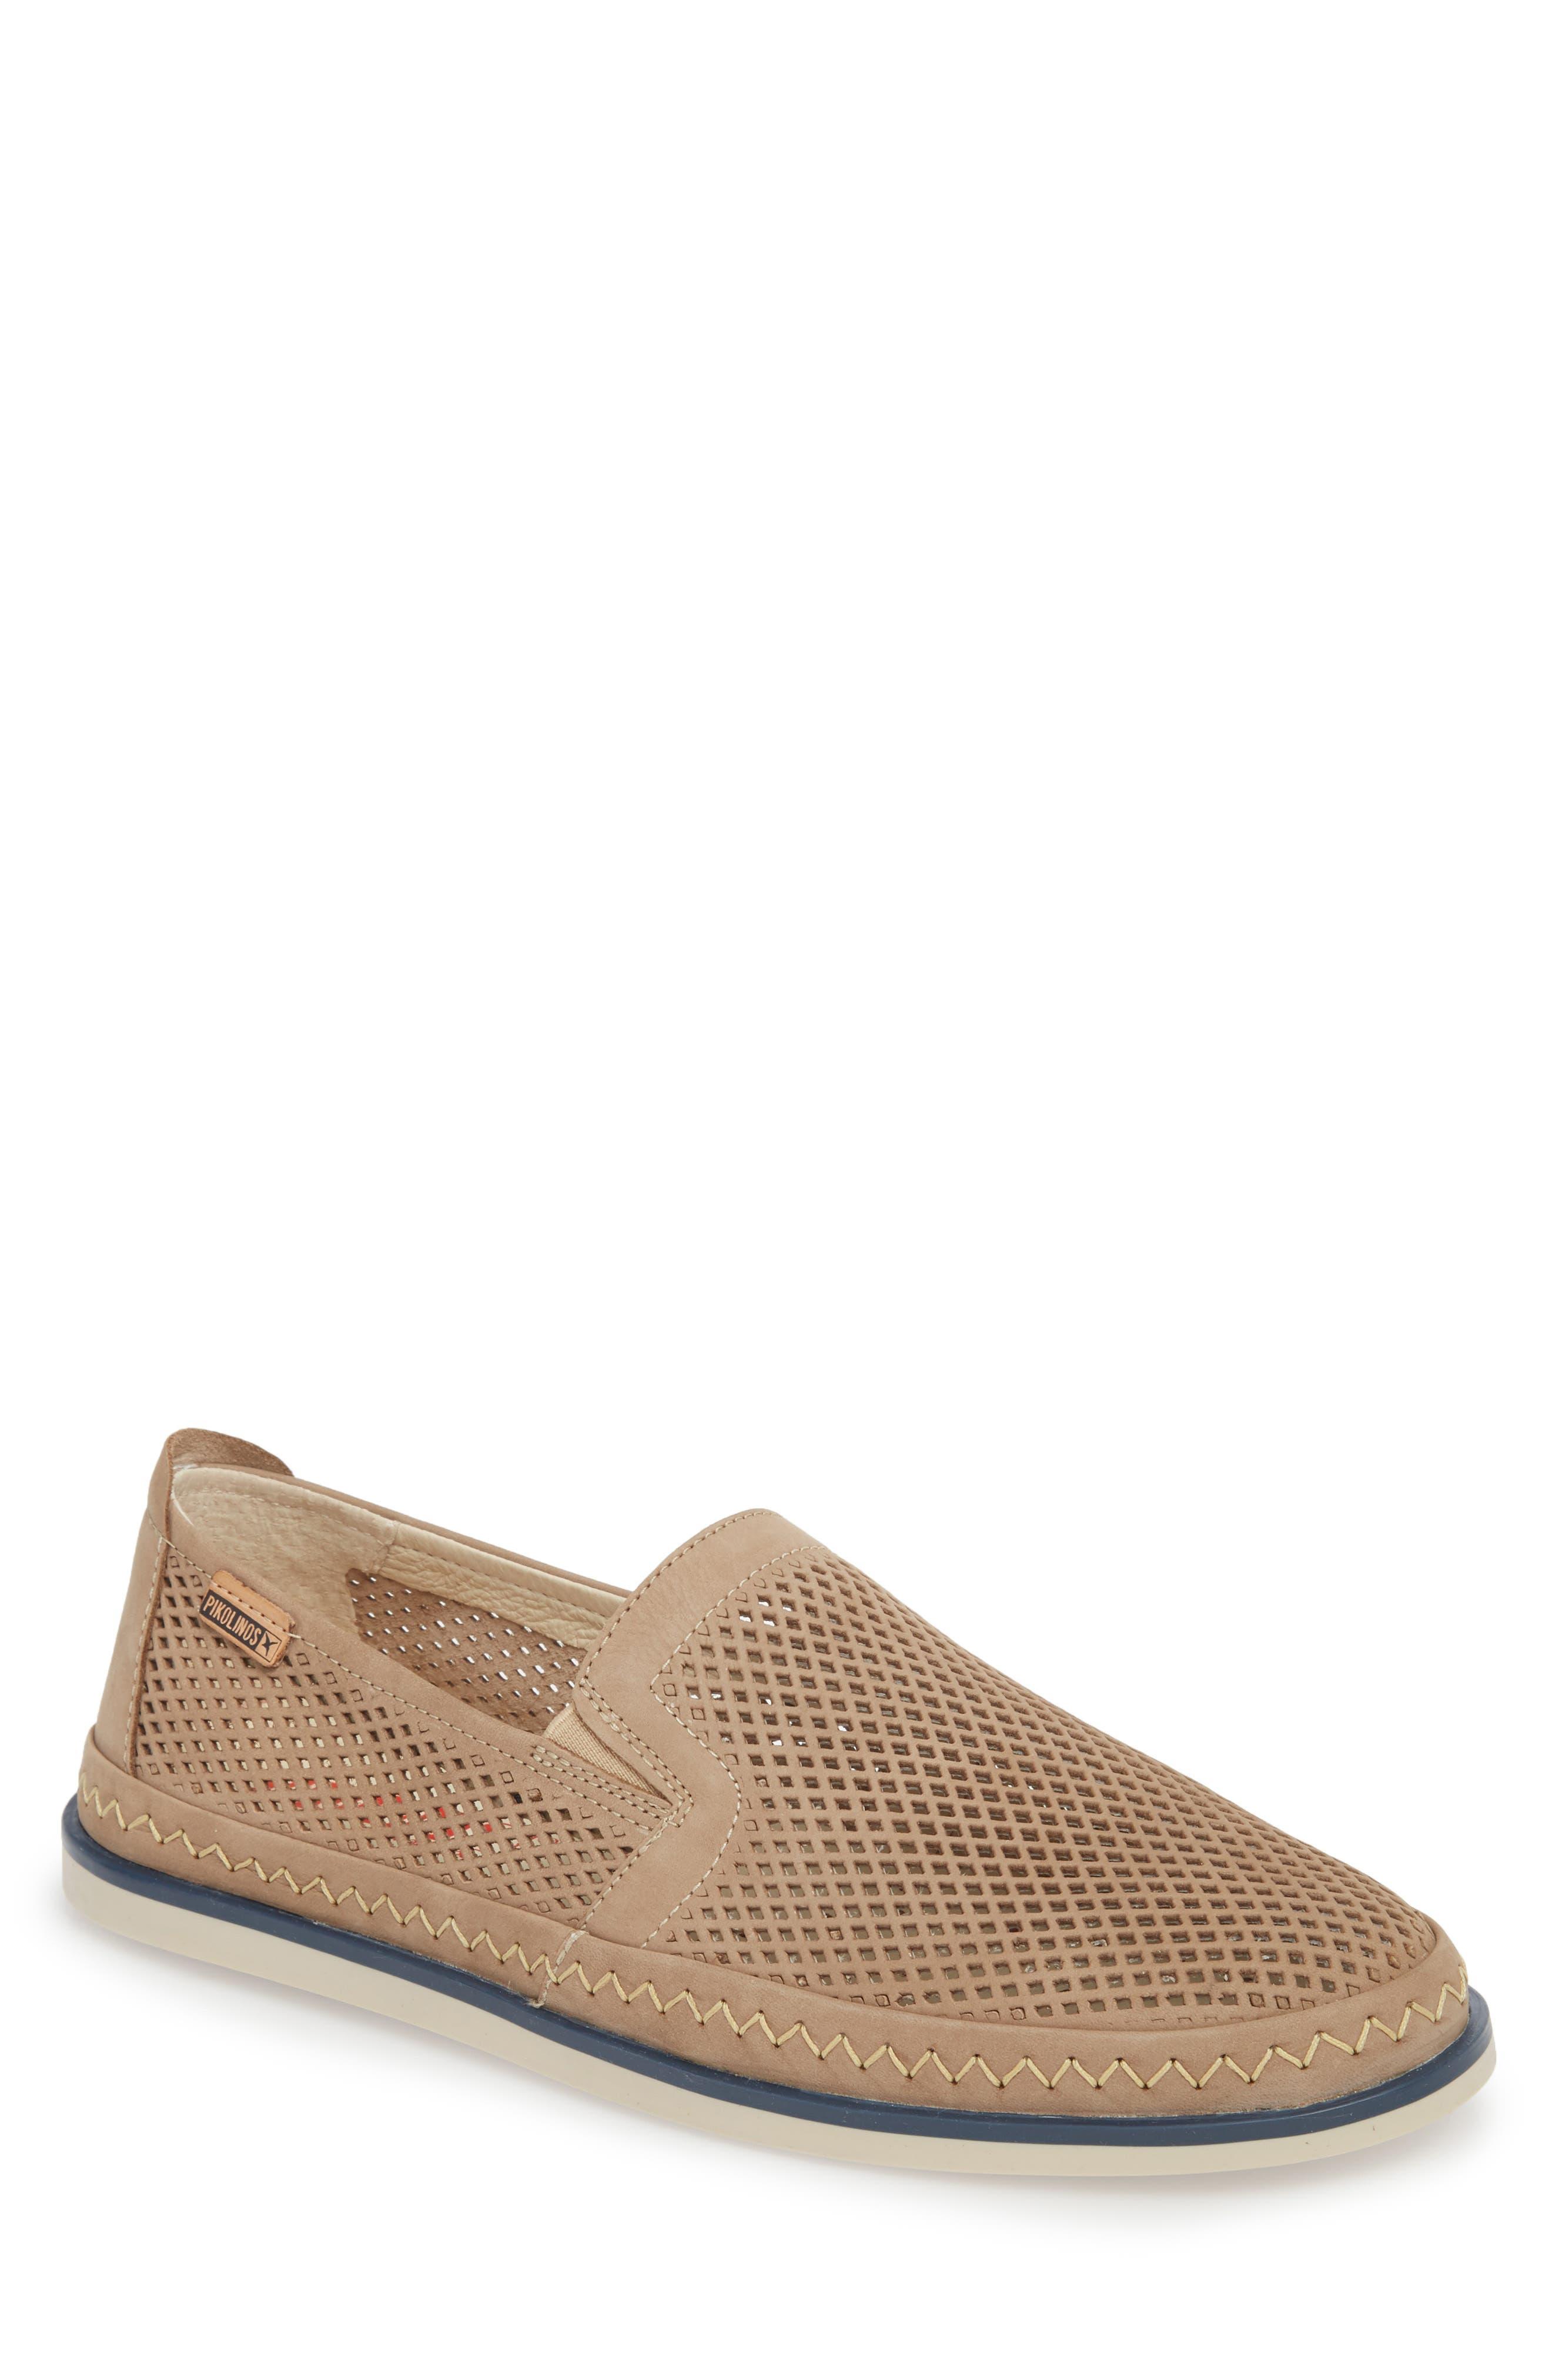 Linares Slip-On Loafer,                         Main,                         color, 250